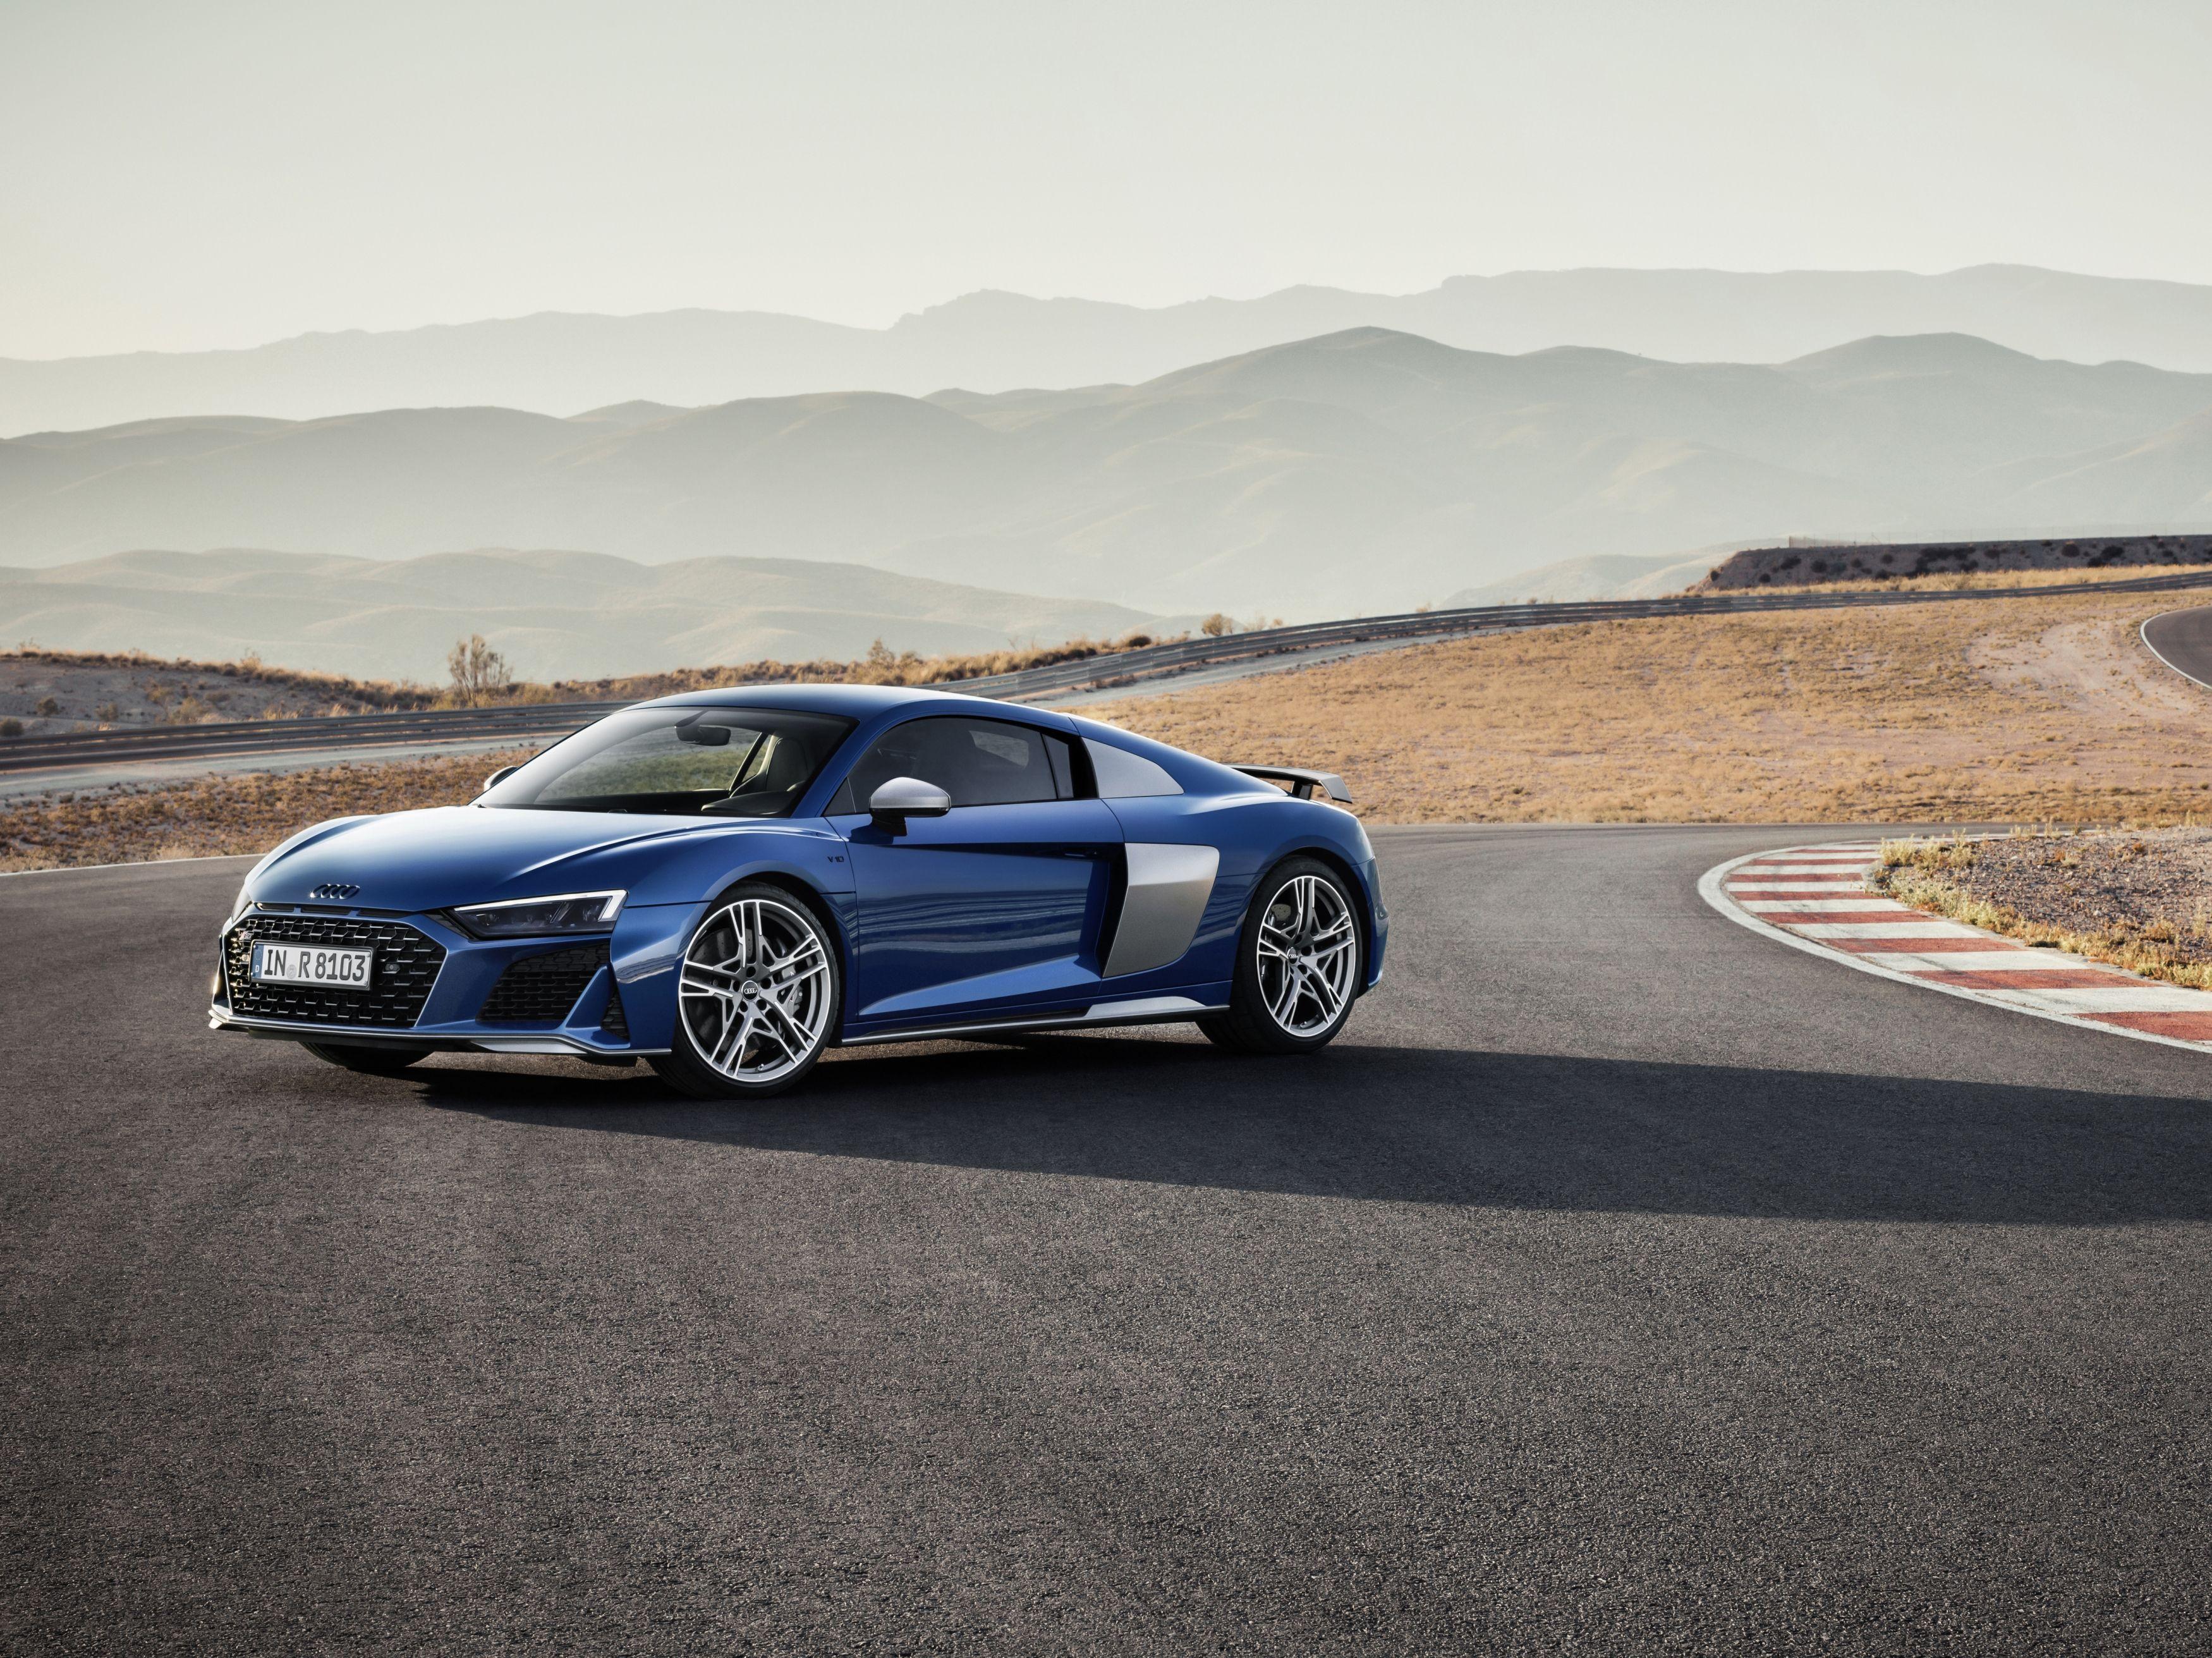 2020 Audi R8 Expert Review Audi Audi R8 Super Cars